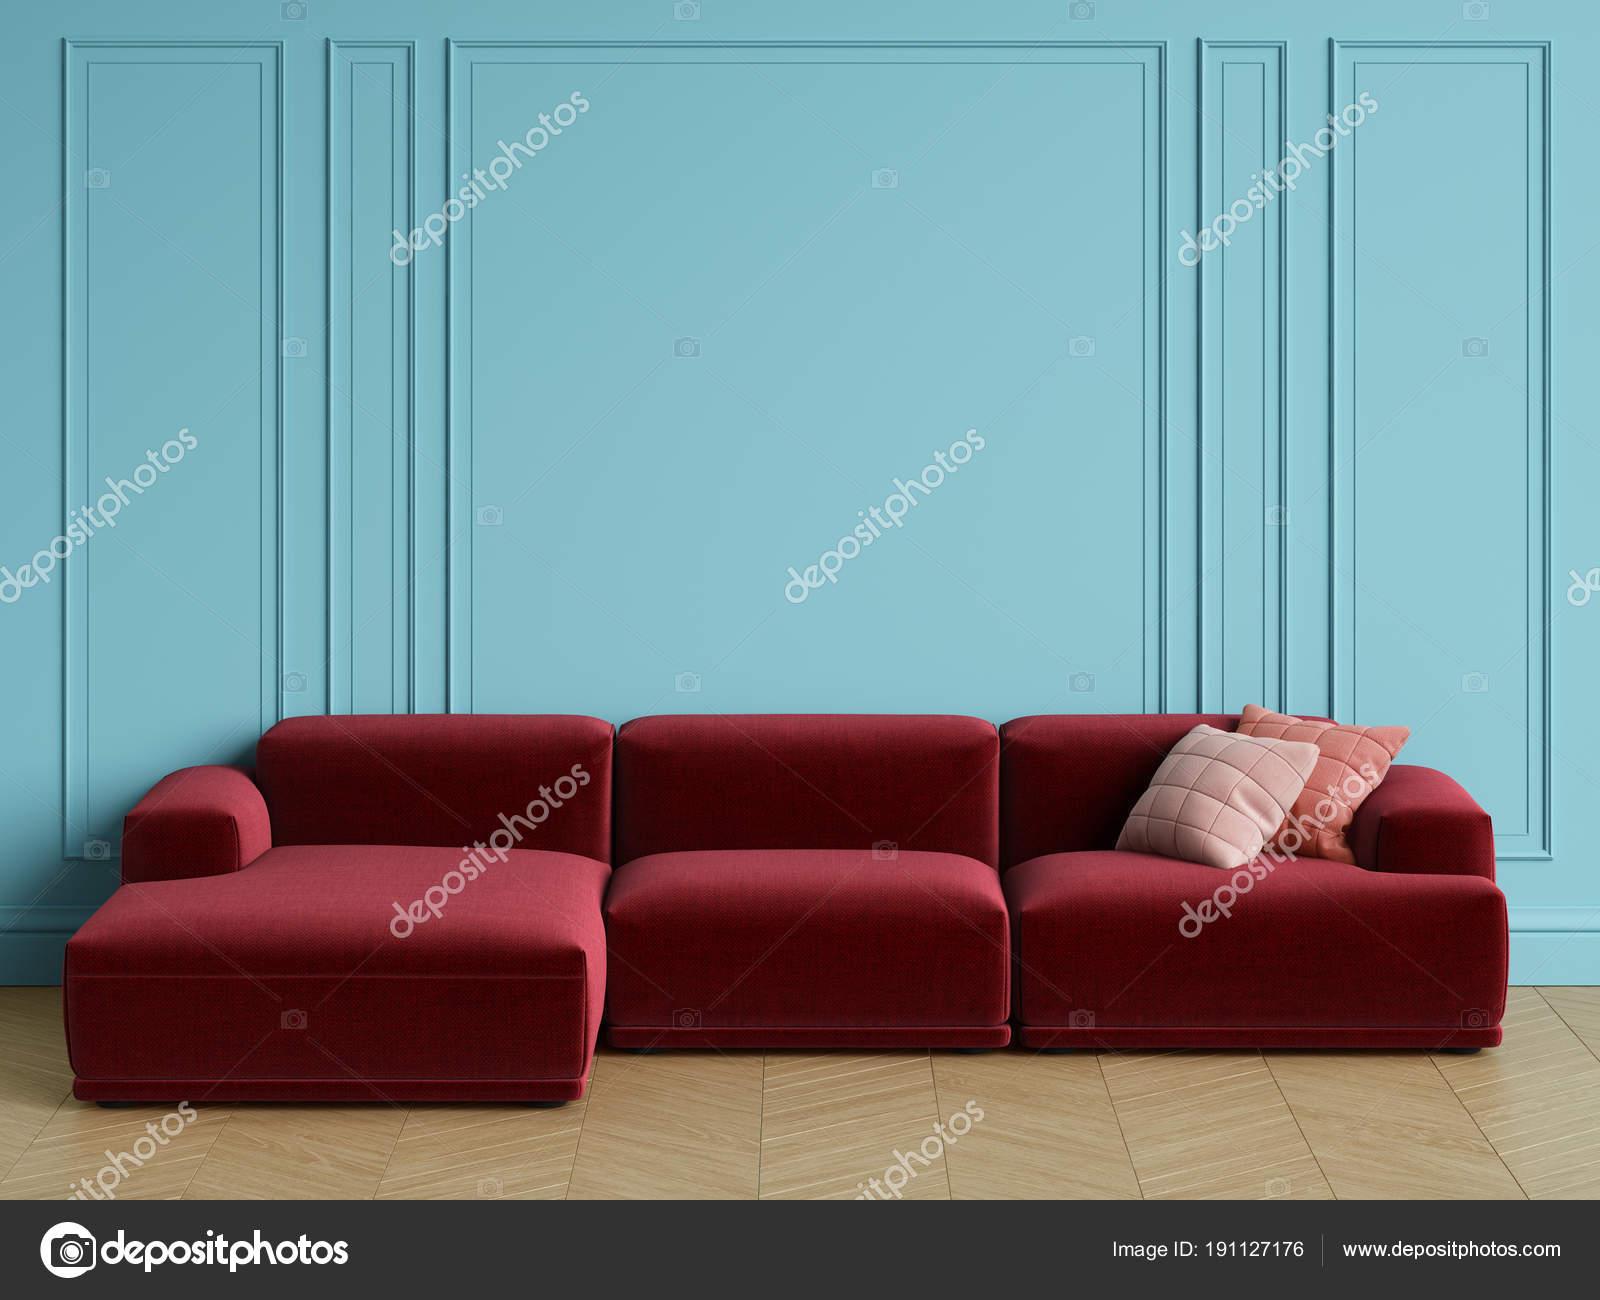 Marvelous Modern Scandinavian Design Red Sofa Interior Blue Walls Inzonedesignstudio Interior Chair Design Inzonedesignstudiocom